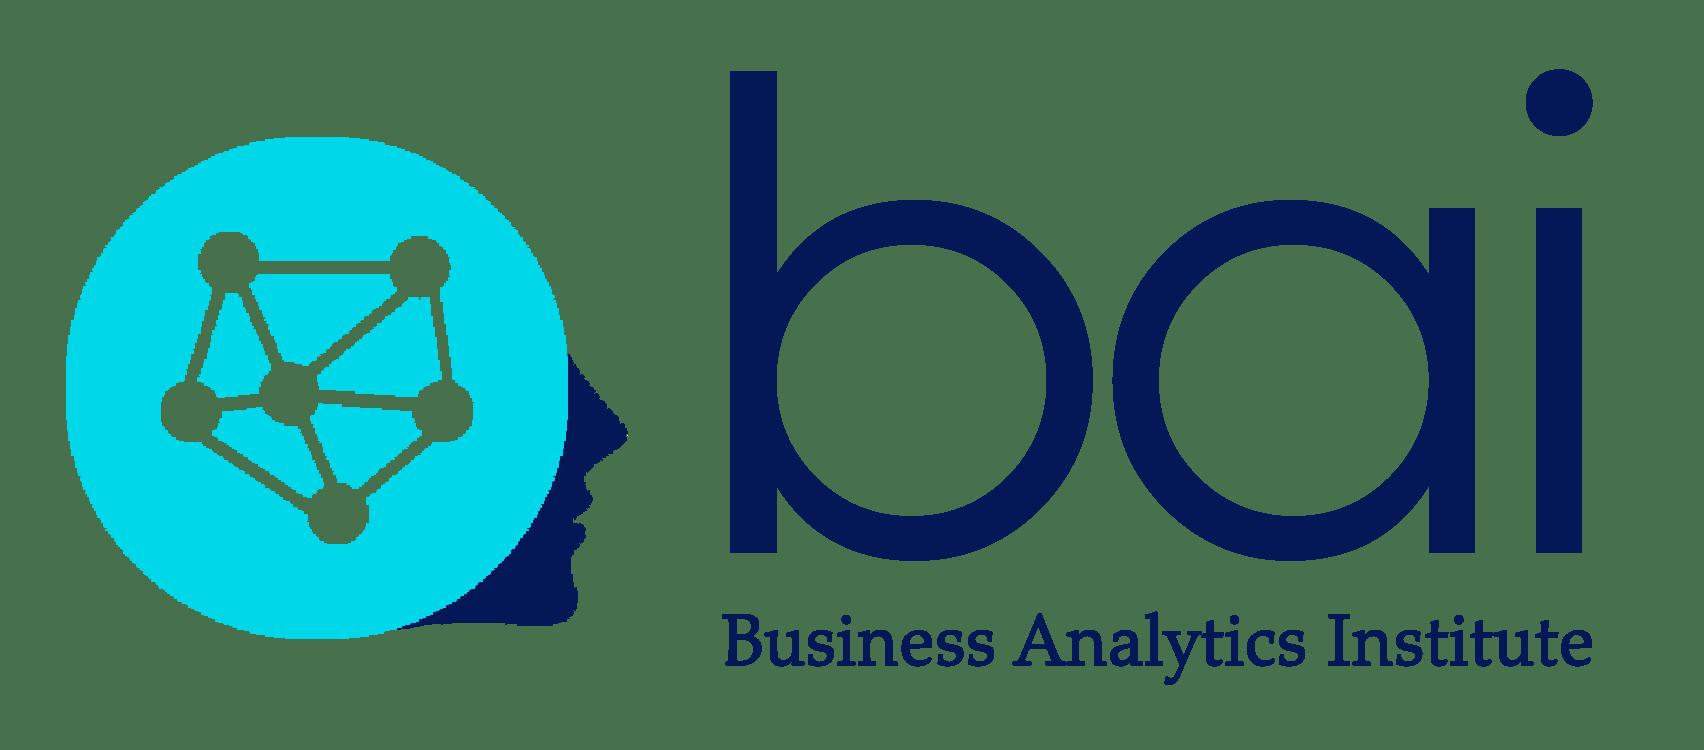 Business Analytics Institute